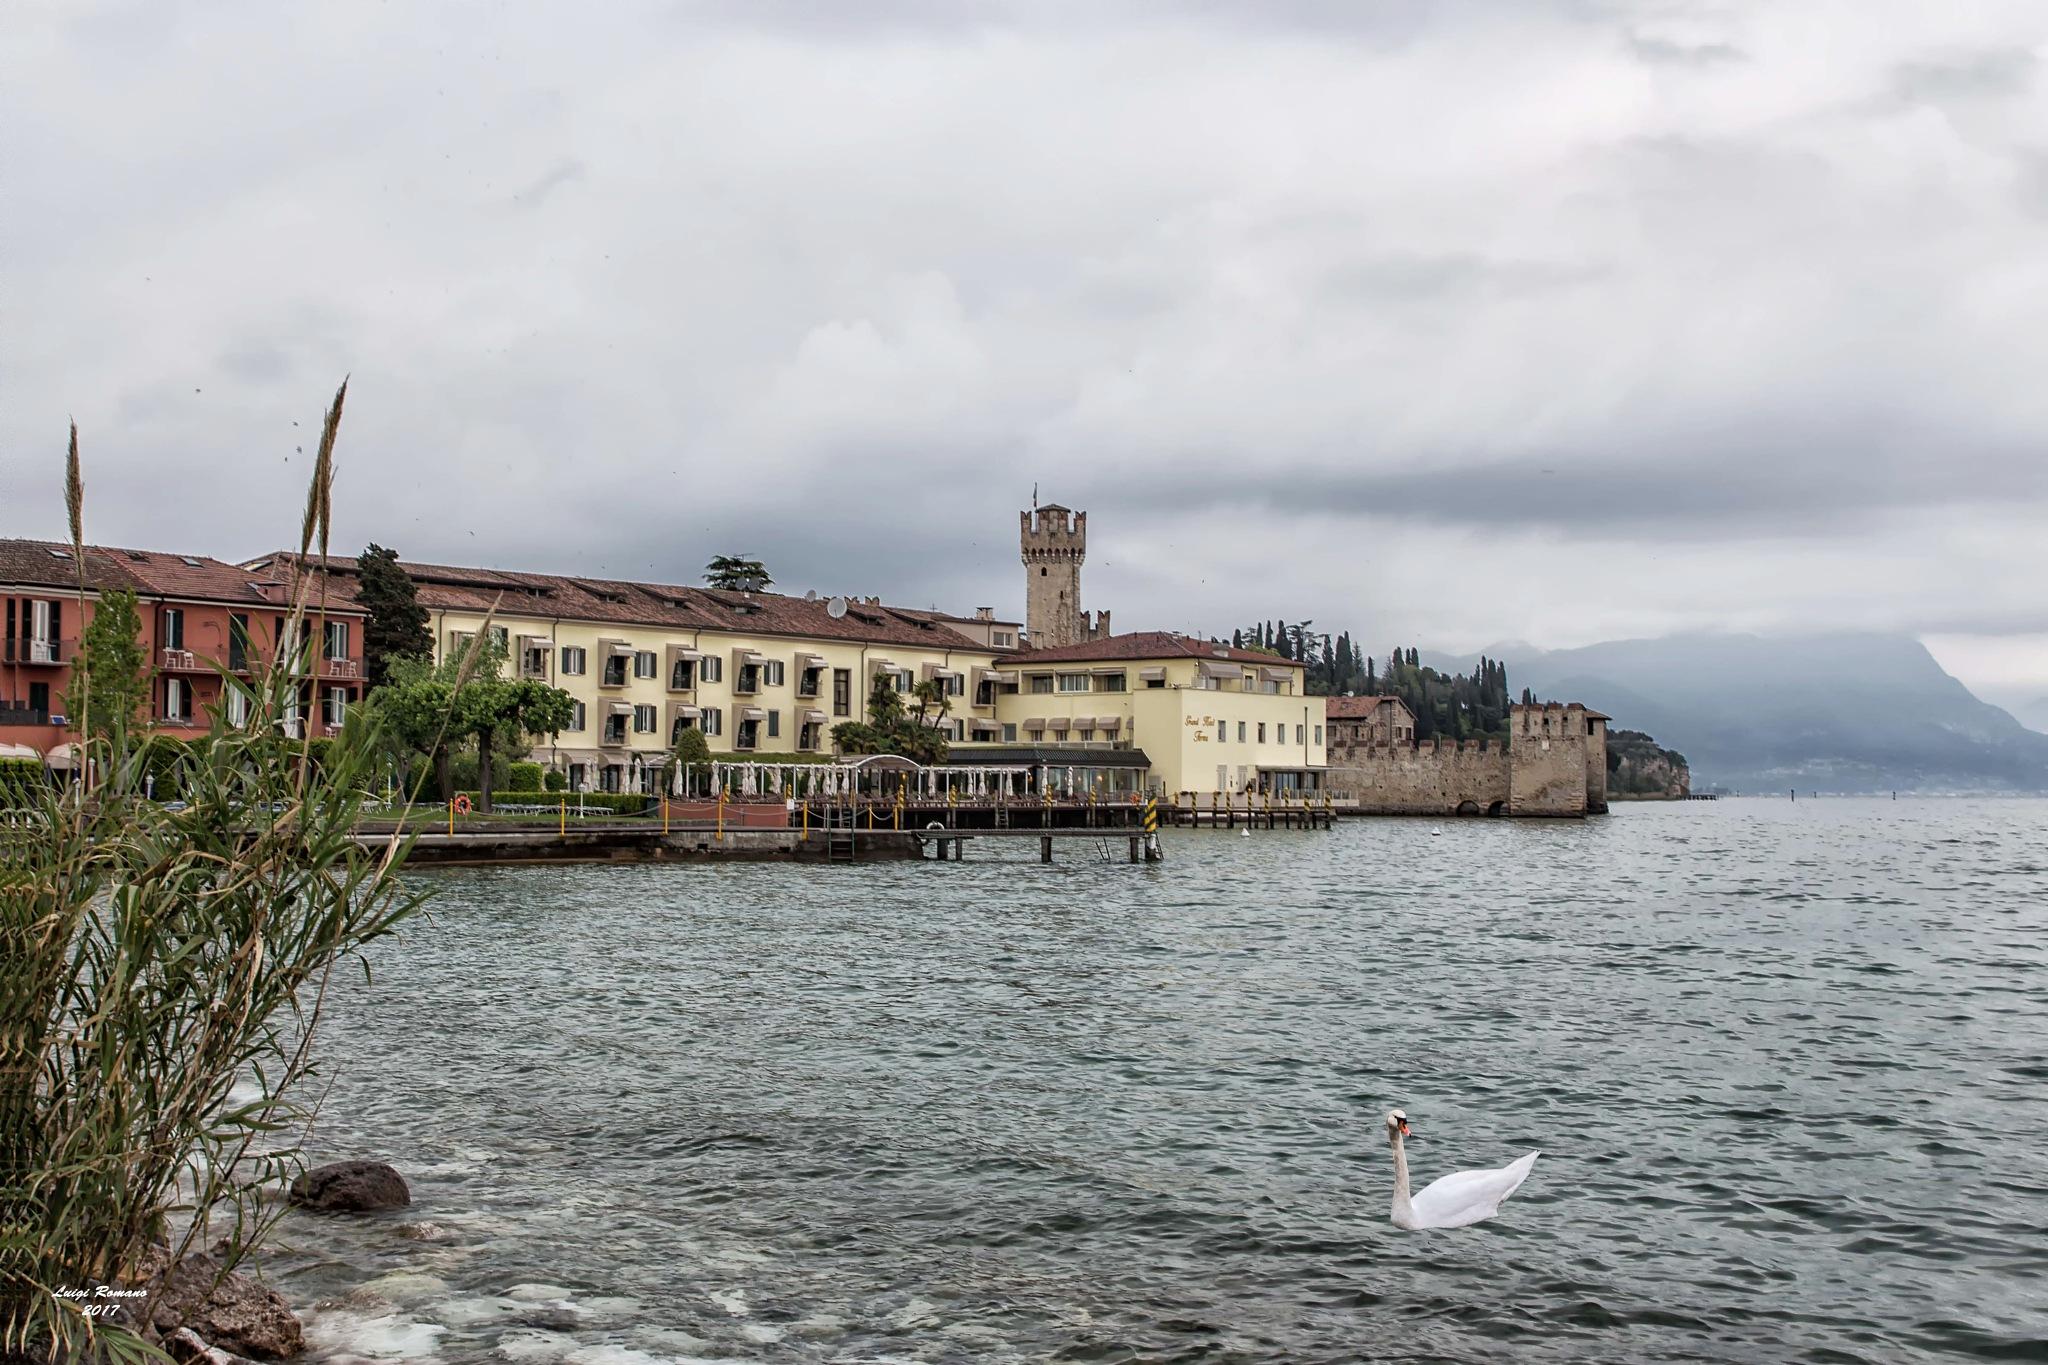 In Sirmione on Lake Garda by Luigi Romano